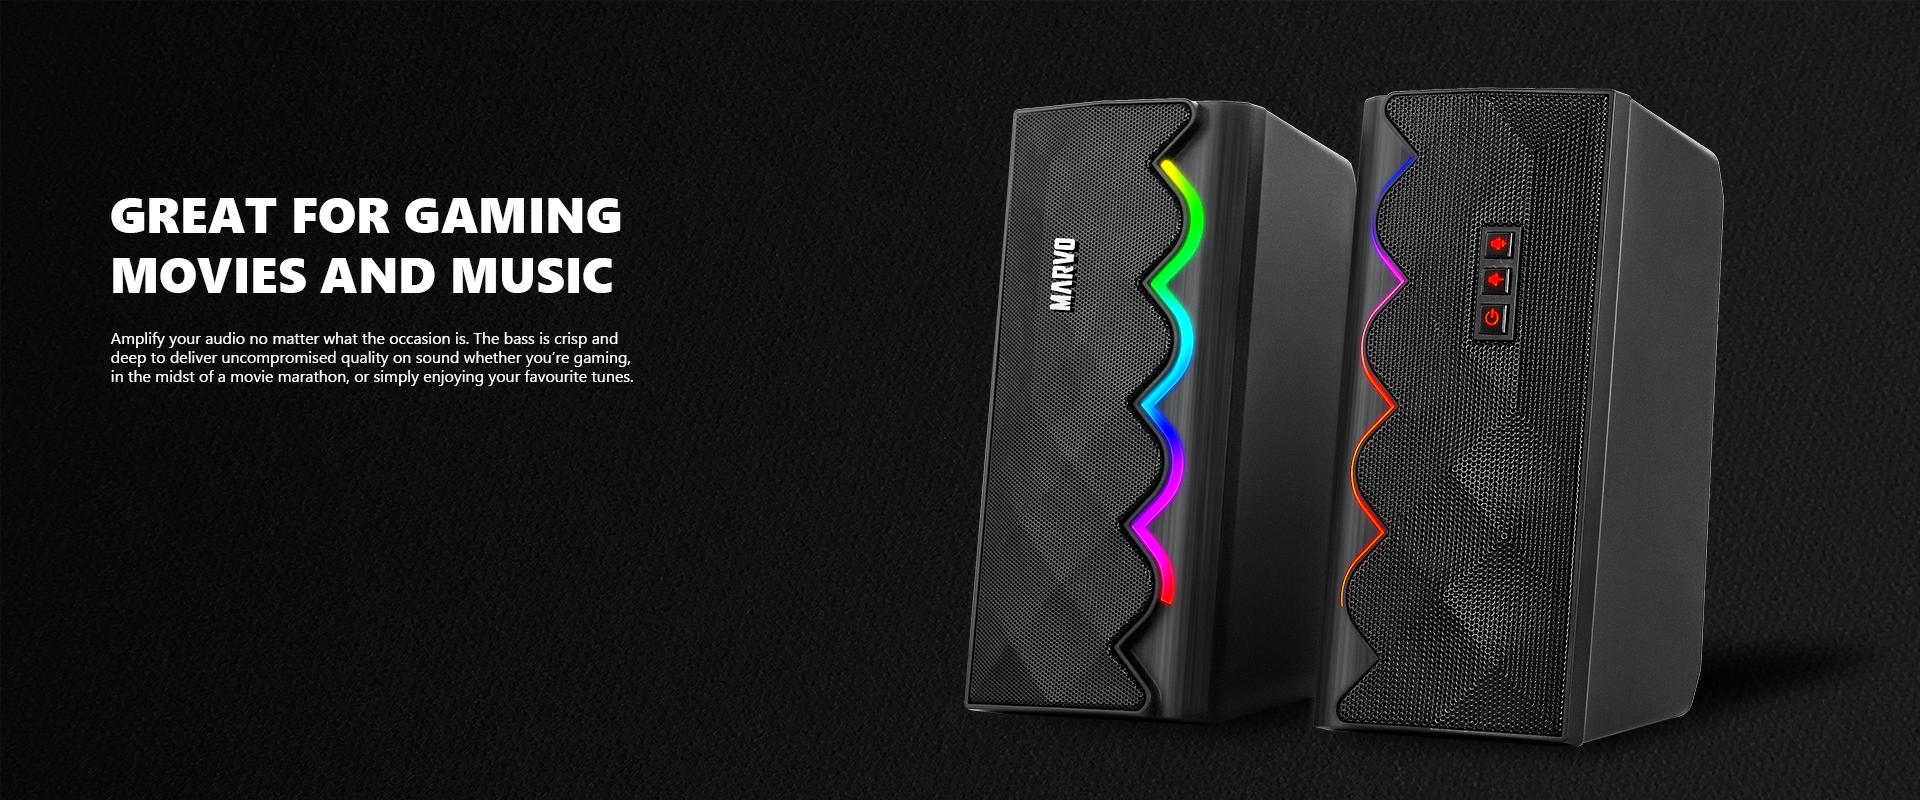 SG269_RGB_PC_Gaming_Speakers_PC_3.png